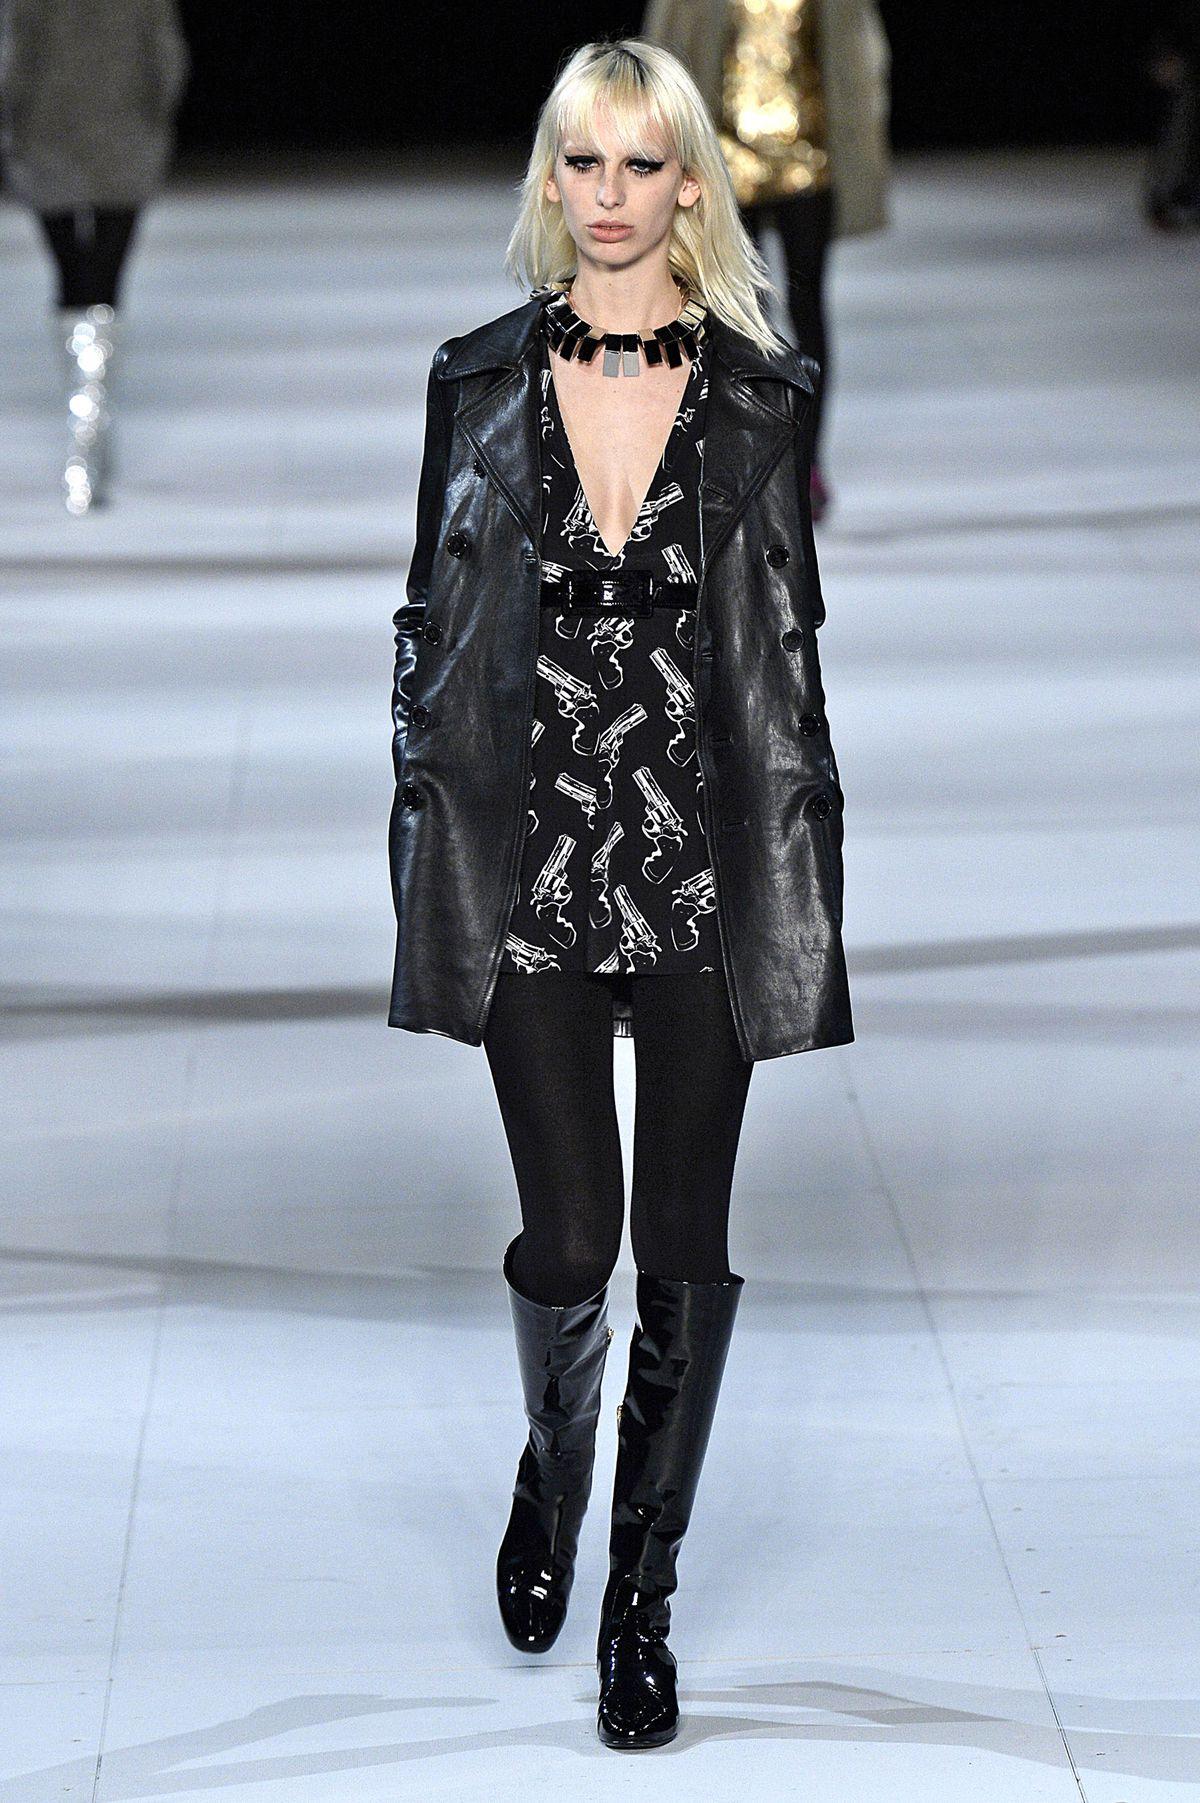 A Saint Laurent model walks the runway in a gun-print shirt.